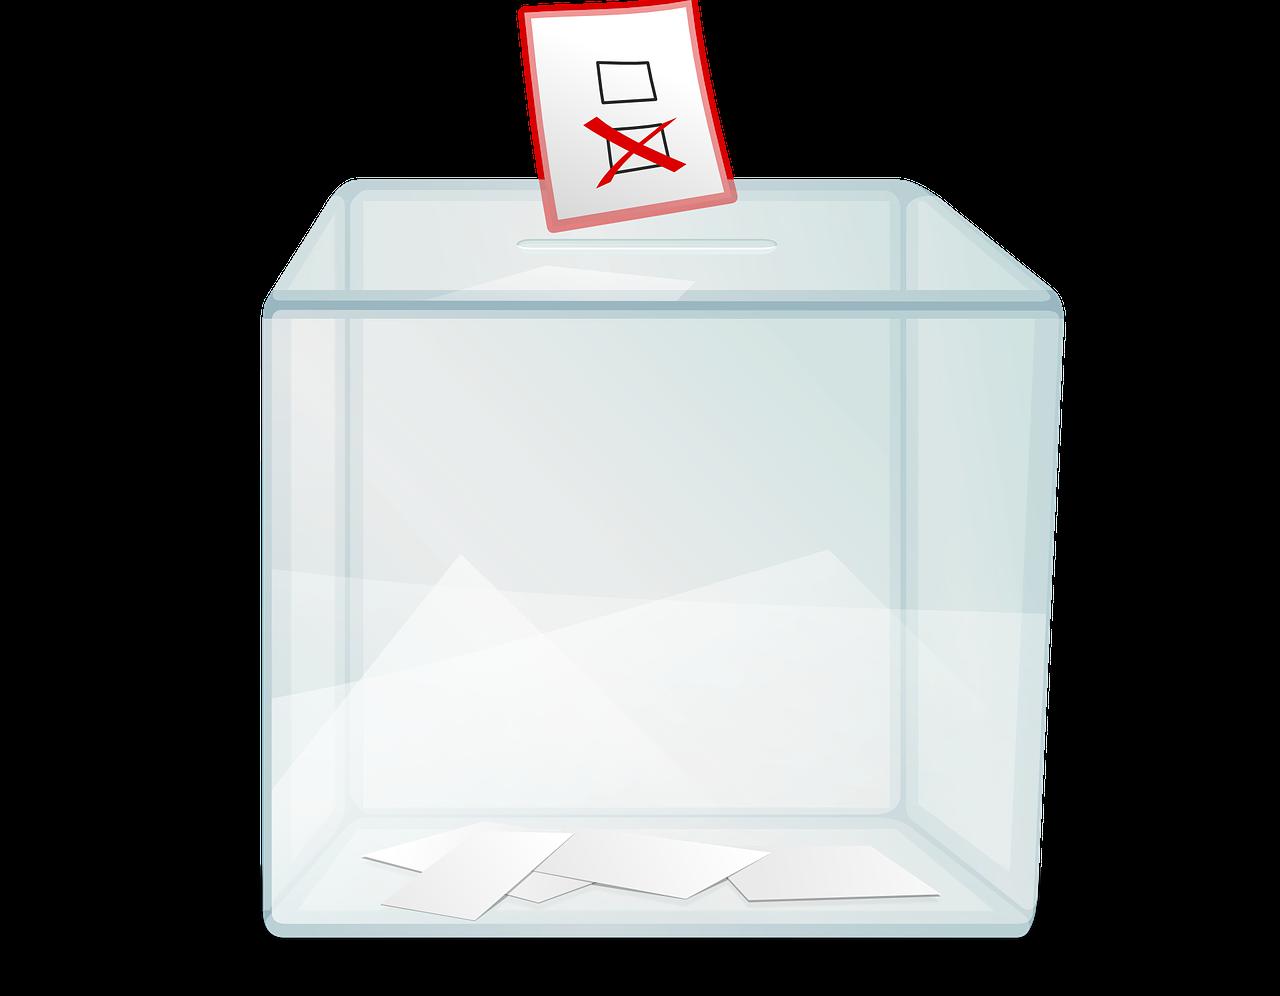 ballot-box-32384_1280.png